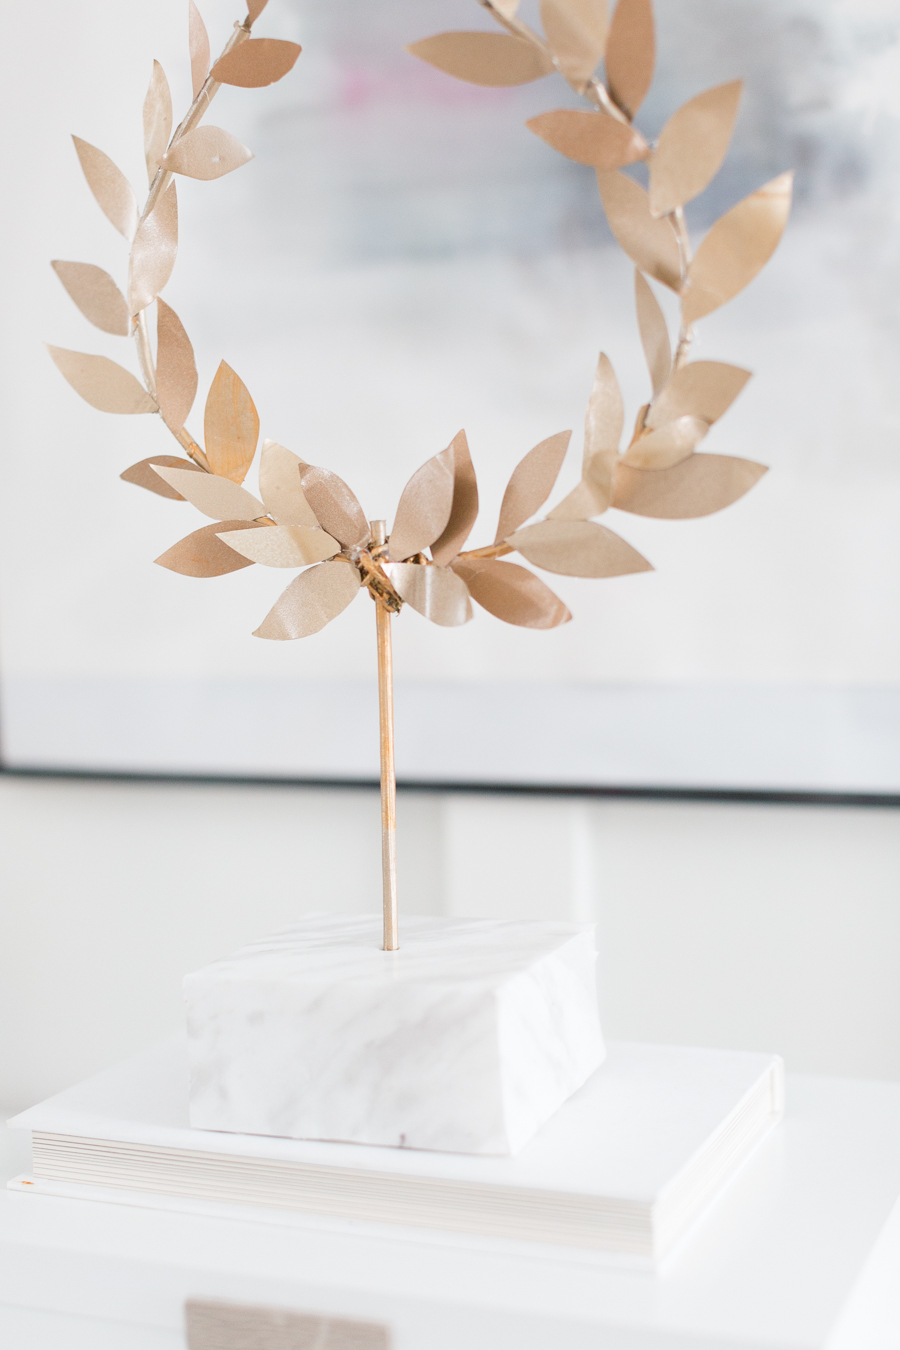 faux kotinos wreath craftberrybush-11